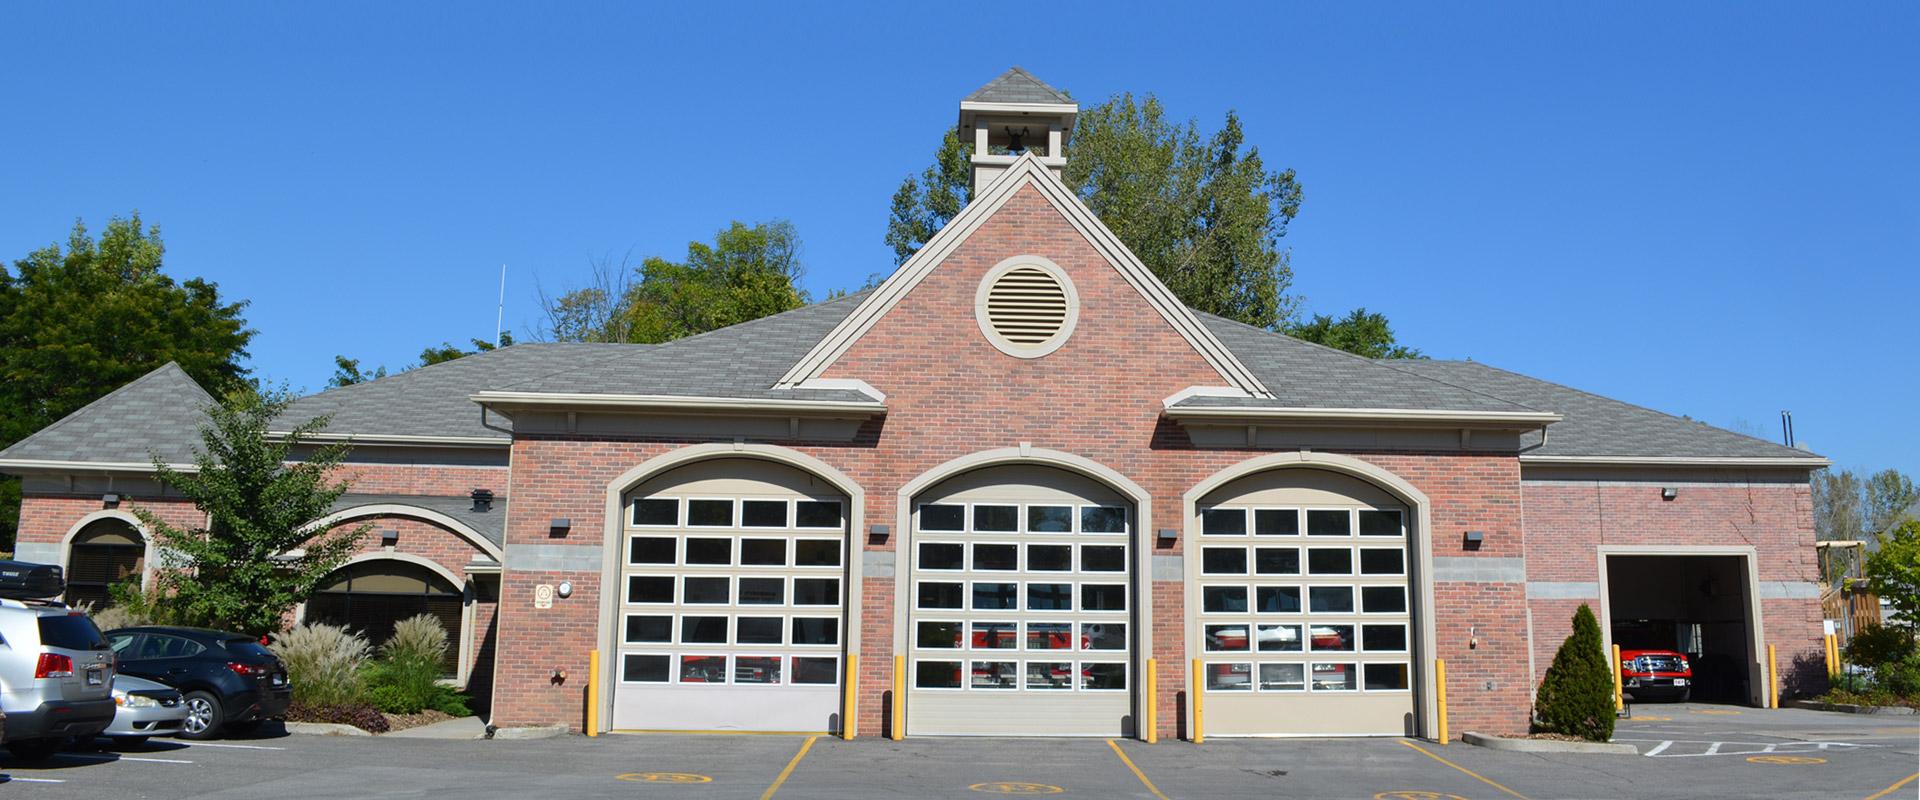 Caserne de pompiers | Rosemère